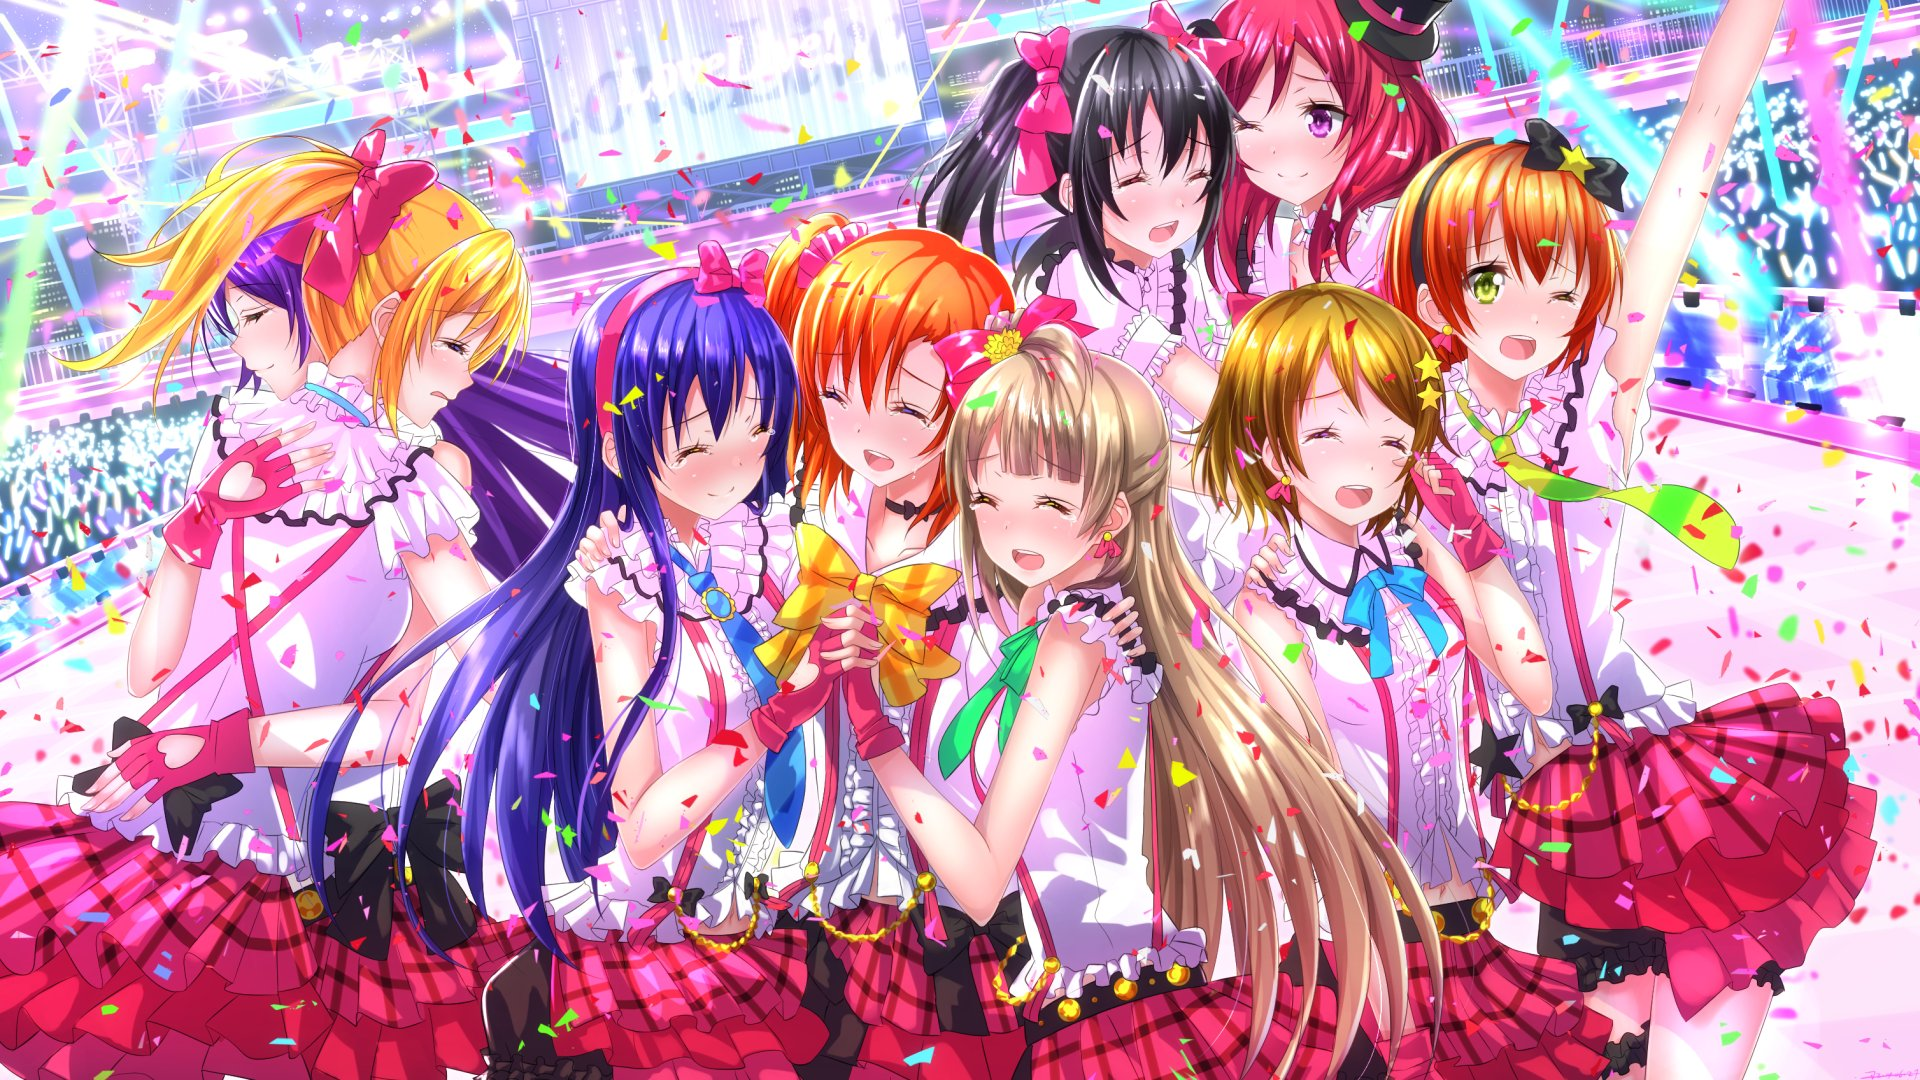 Long hair dress beautiful girl characters anime series ...